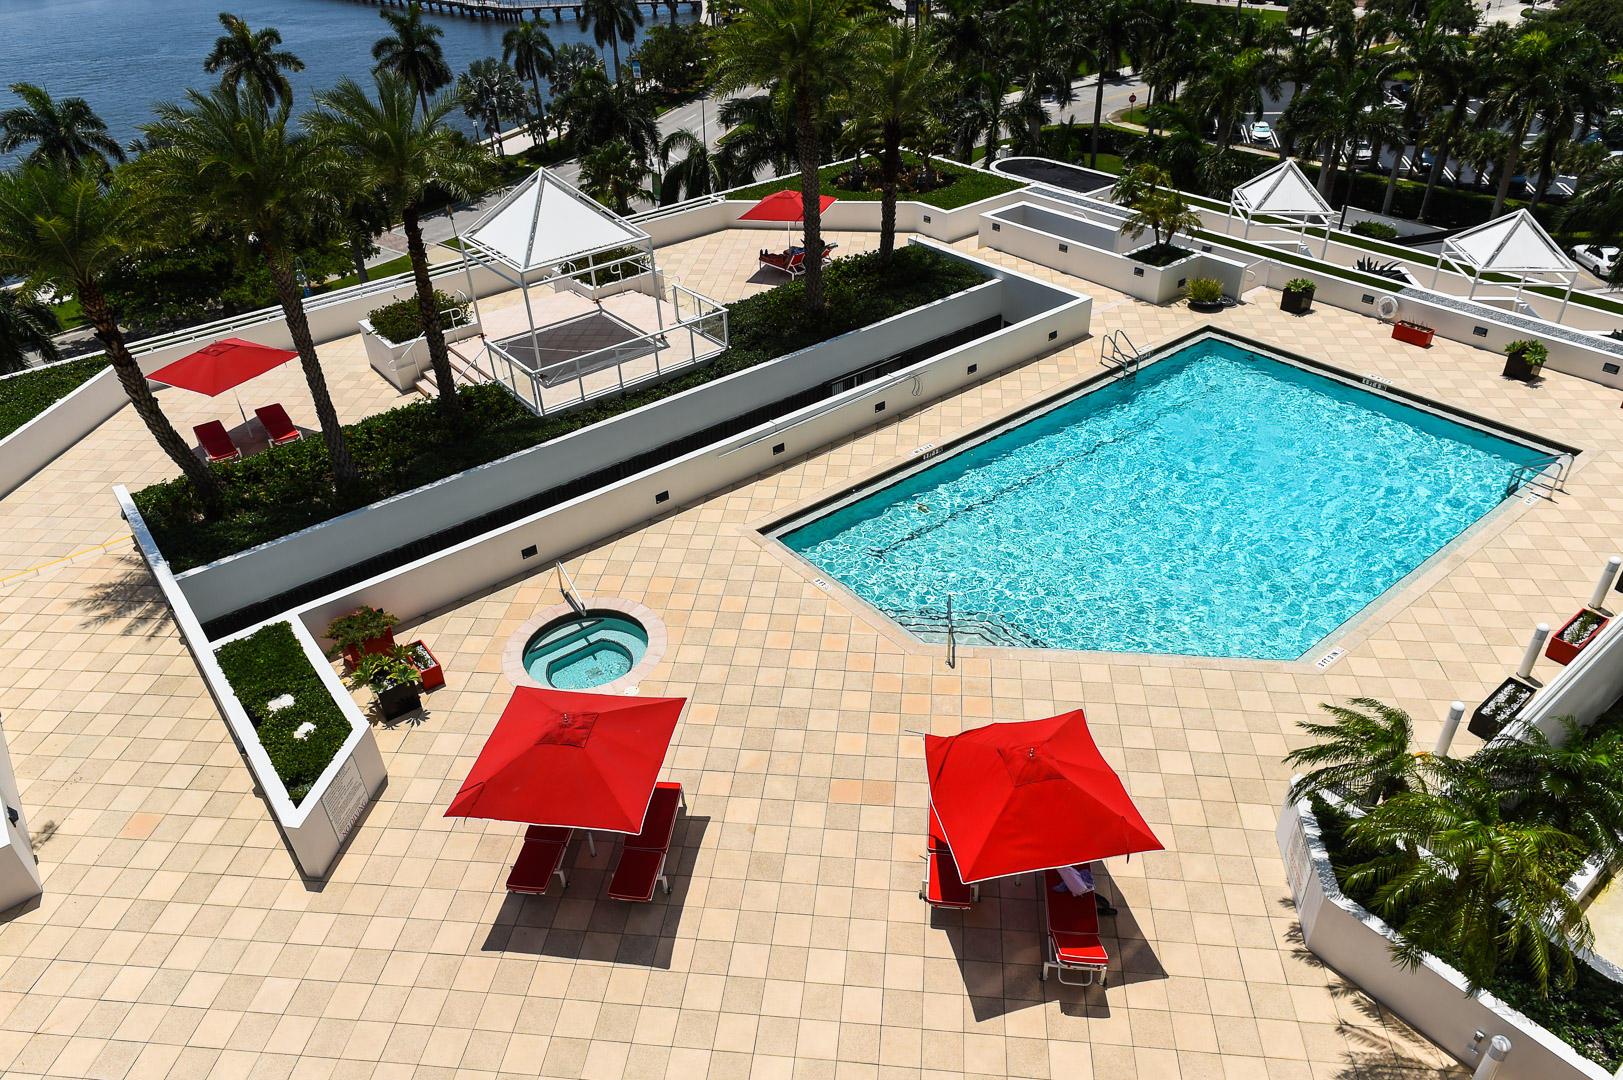 525 S Flagler Drive 9b West Palm Beach, FL 33401